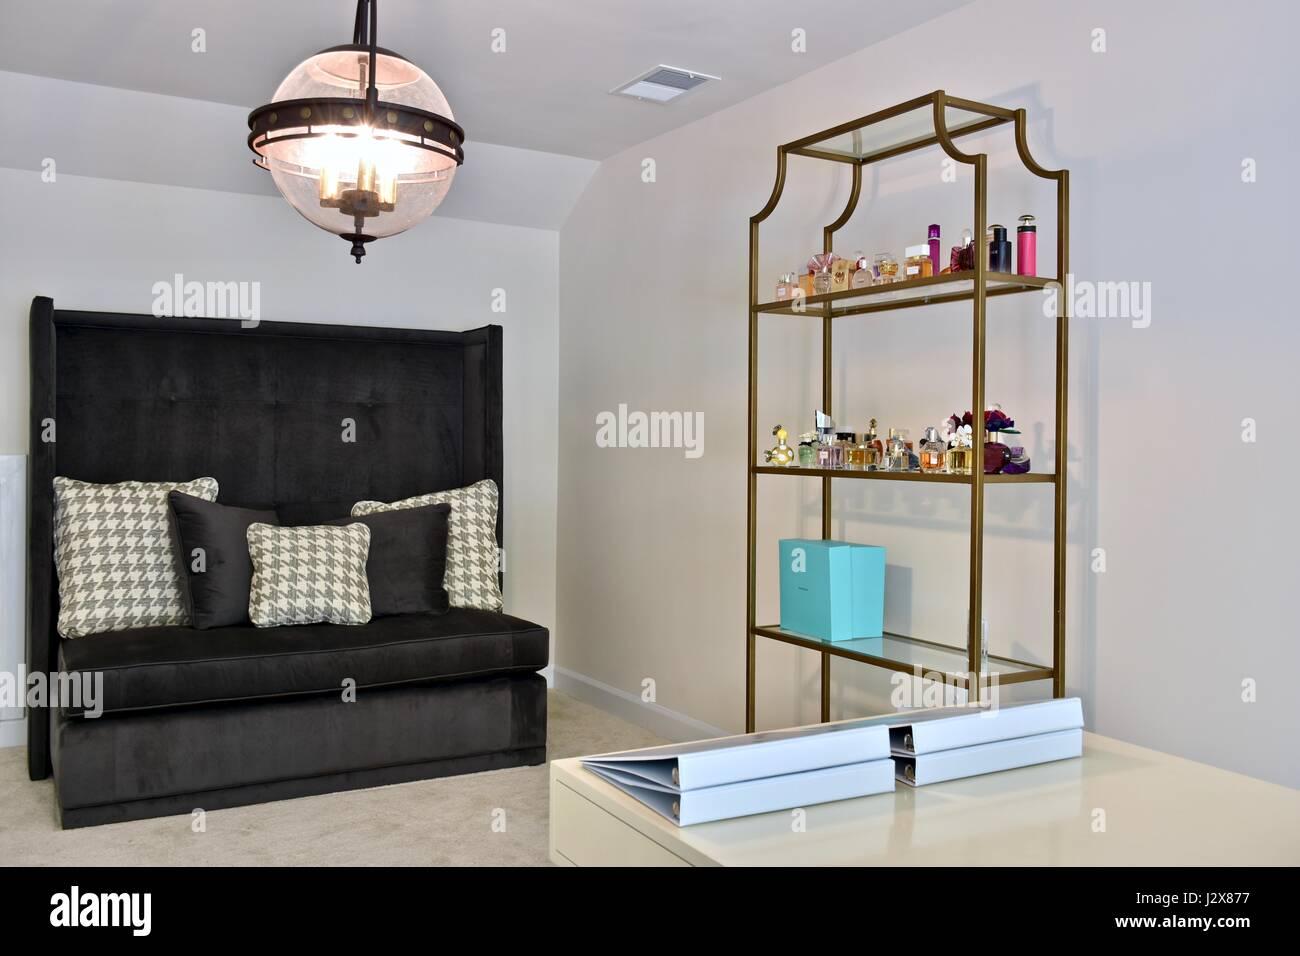 office sleeper ideas decorated upstairs office loft with sofa sleeper stock image sleeper sofa photos images alamy